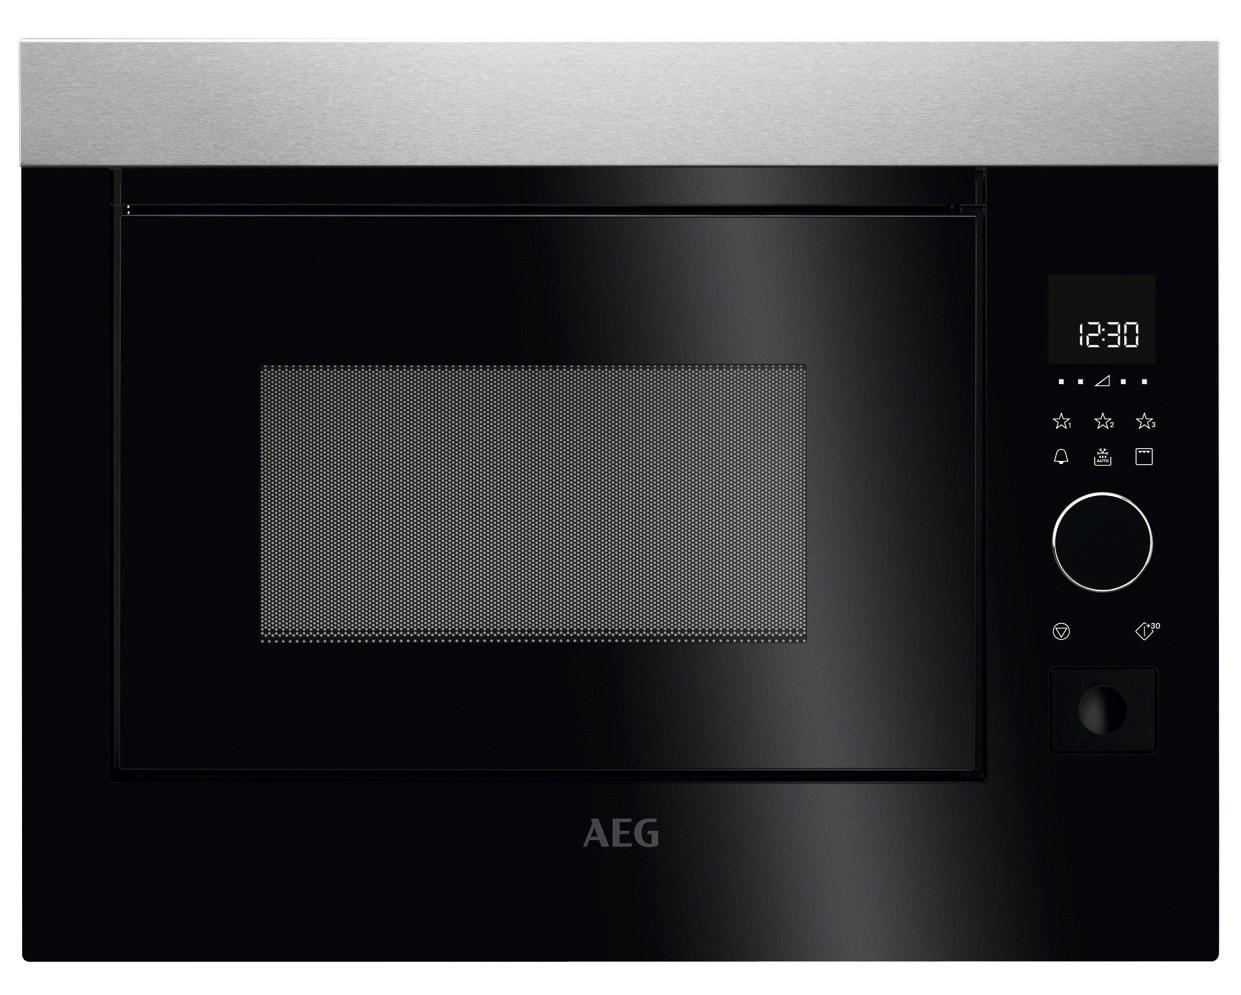 aeg MBE2658D-M forno incasso microonde